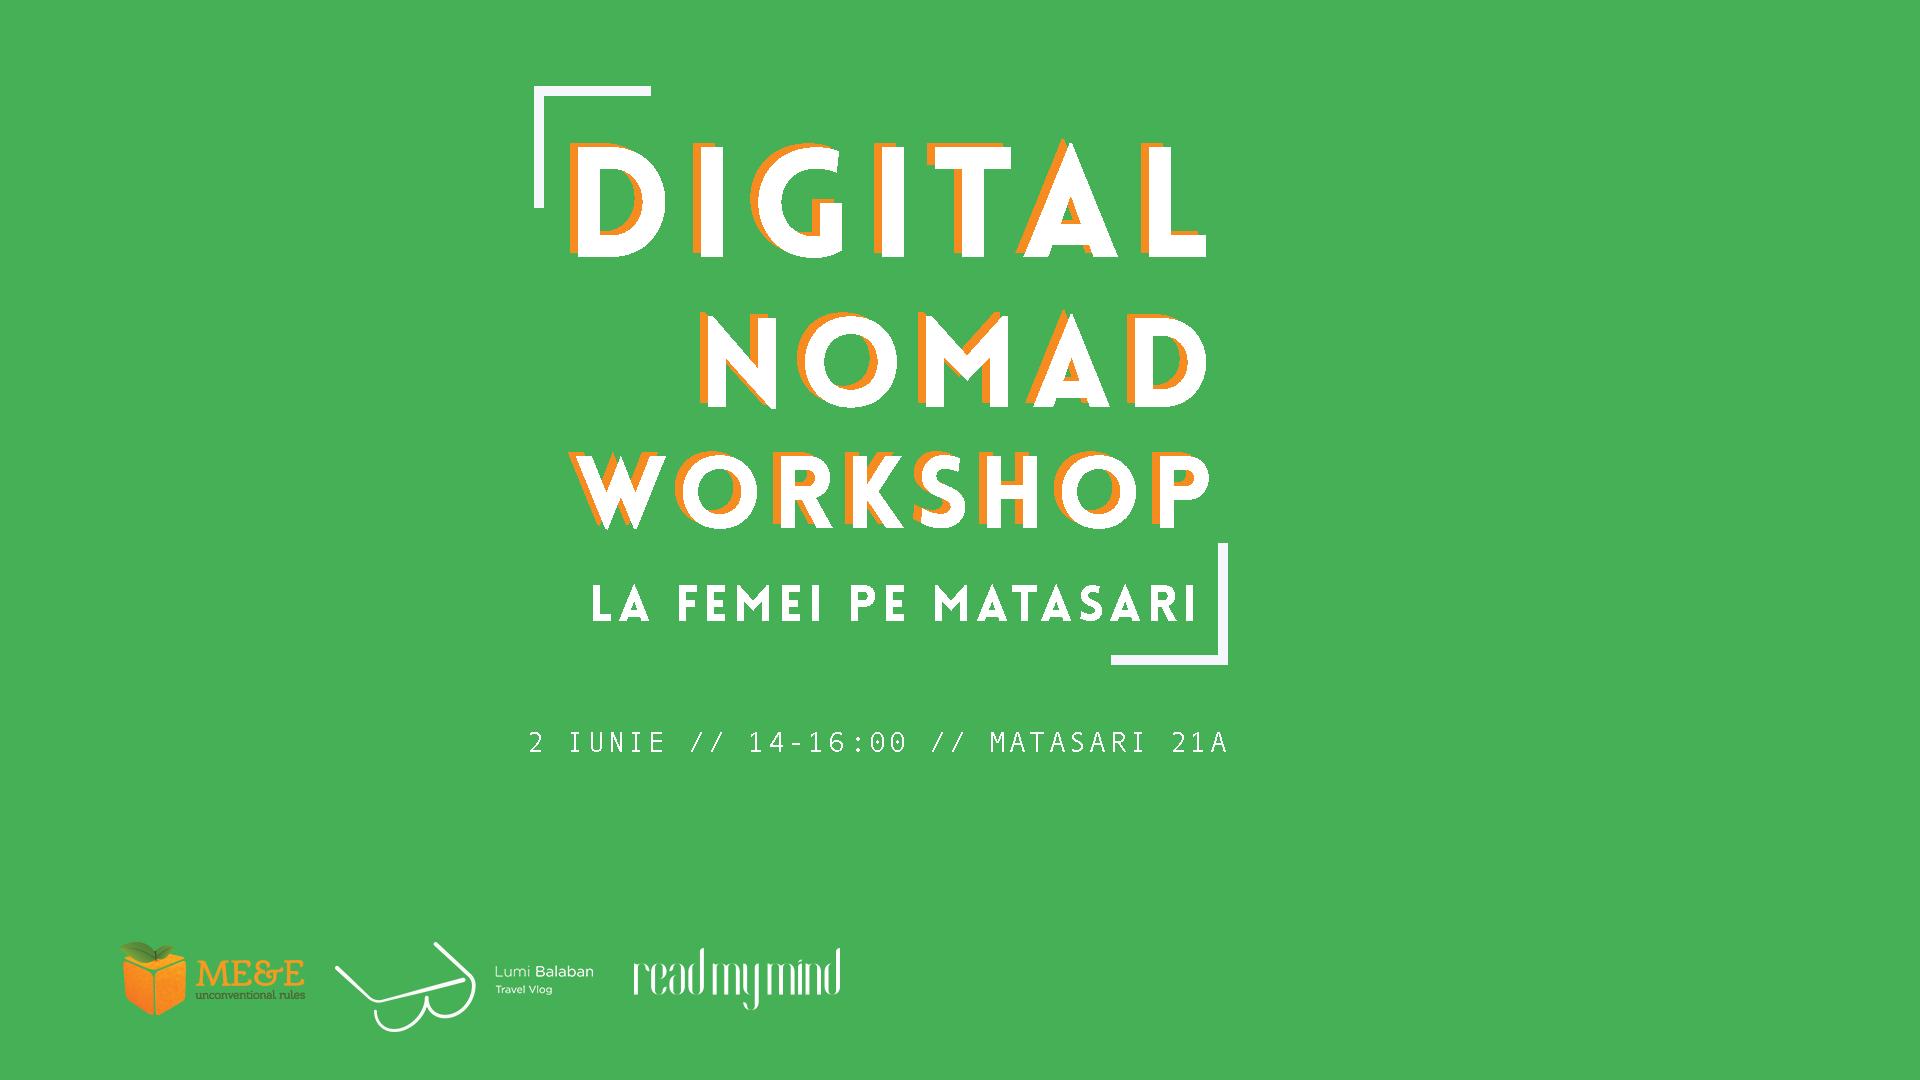 Vă invit la DIGITAL NOMAD Workshop la Femei pe Mătăsari pe 2 iunie!